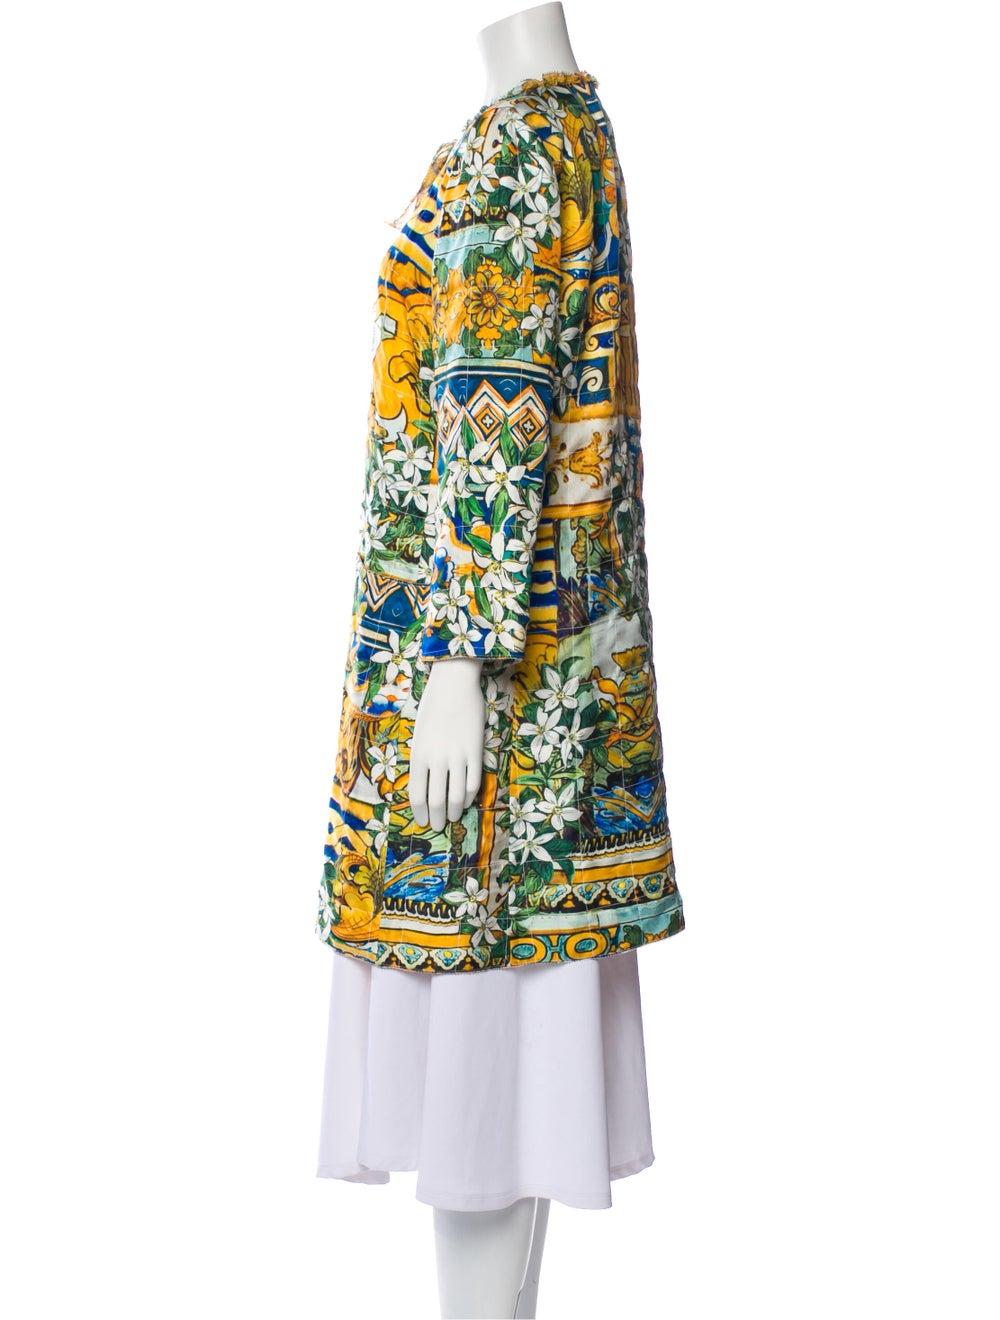 Dolce & Gabbana Silk Printed Robe Yellow - image 2